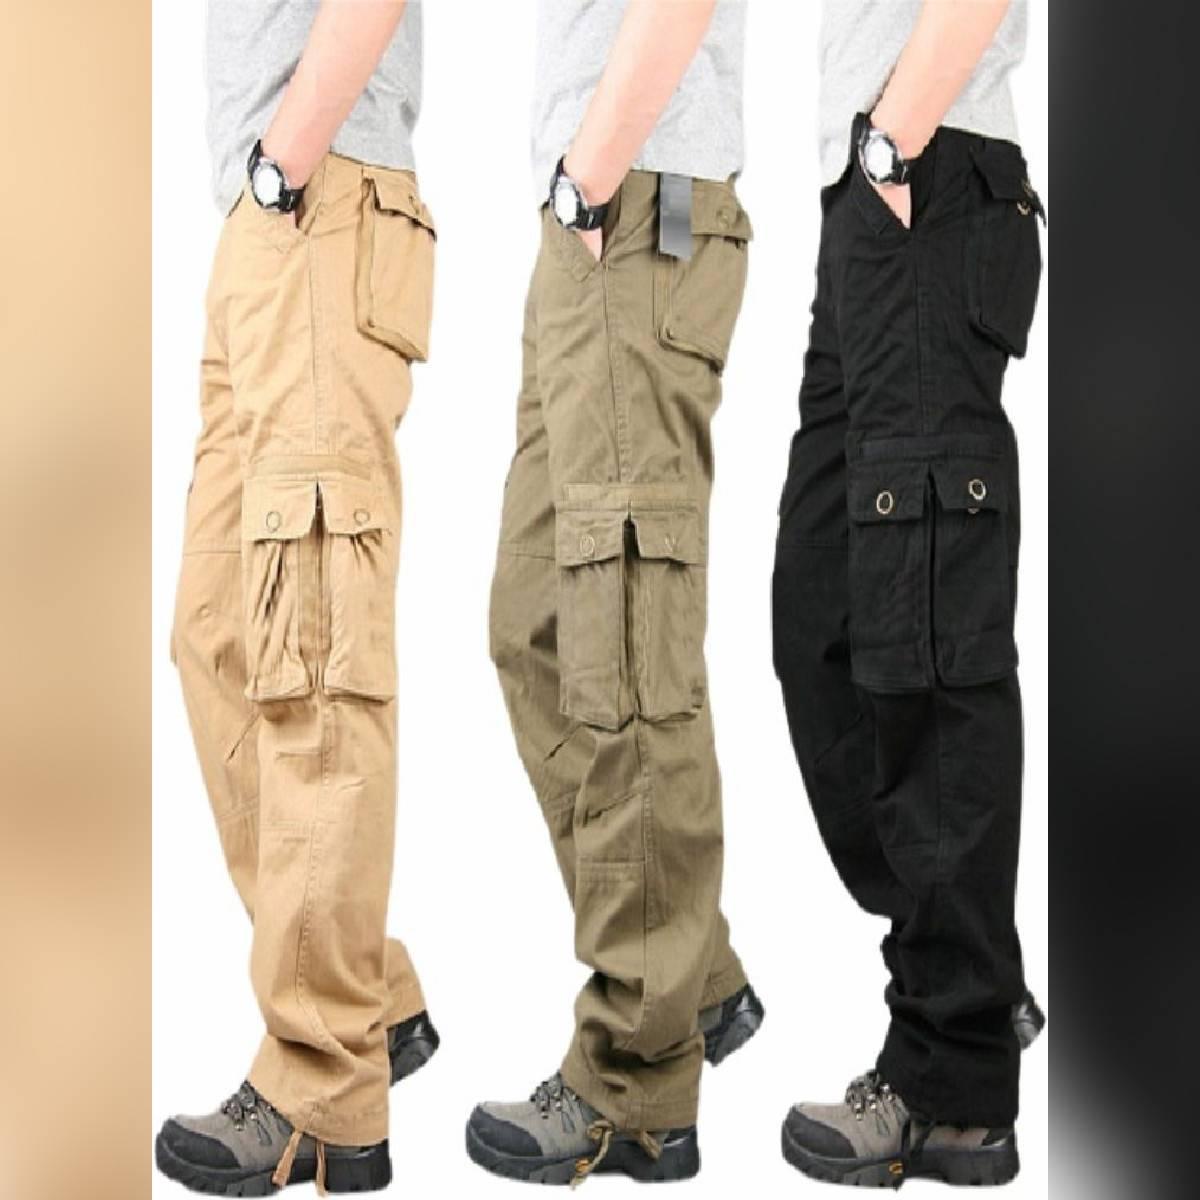 Six Pockets Cargo Trouser Pants - Black